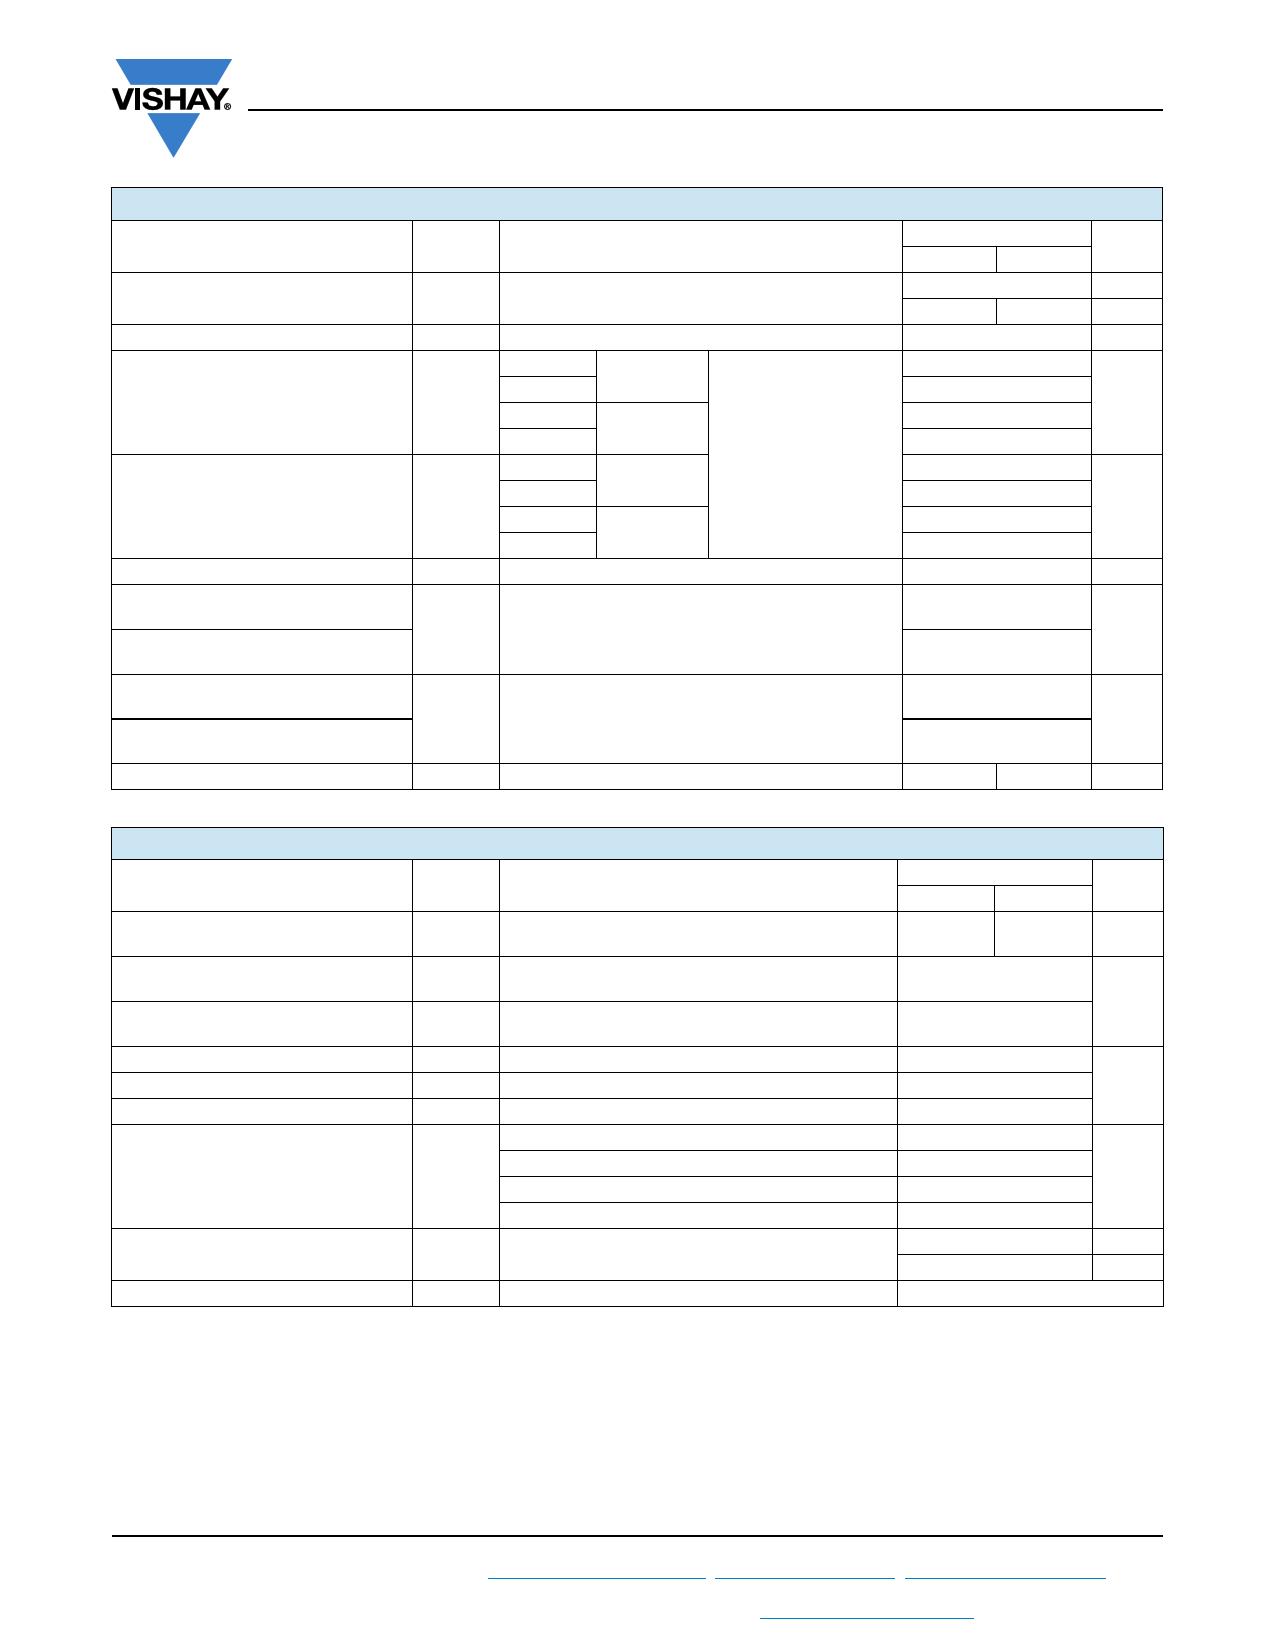 VS-88HFR100 pdf, equivalent, schematic